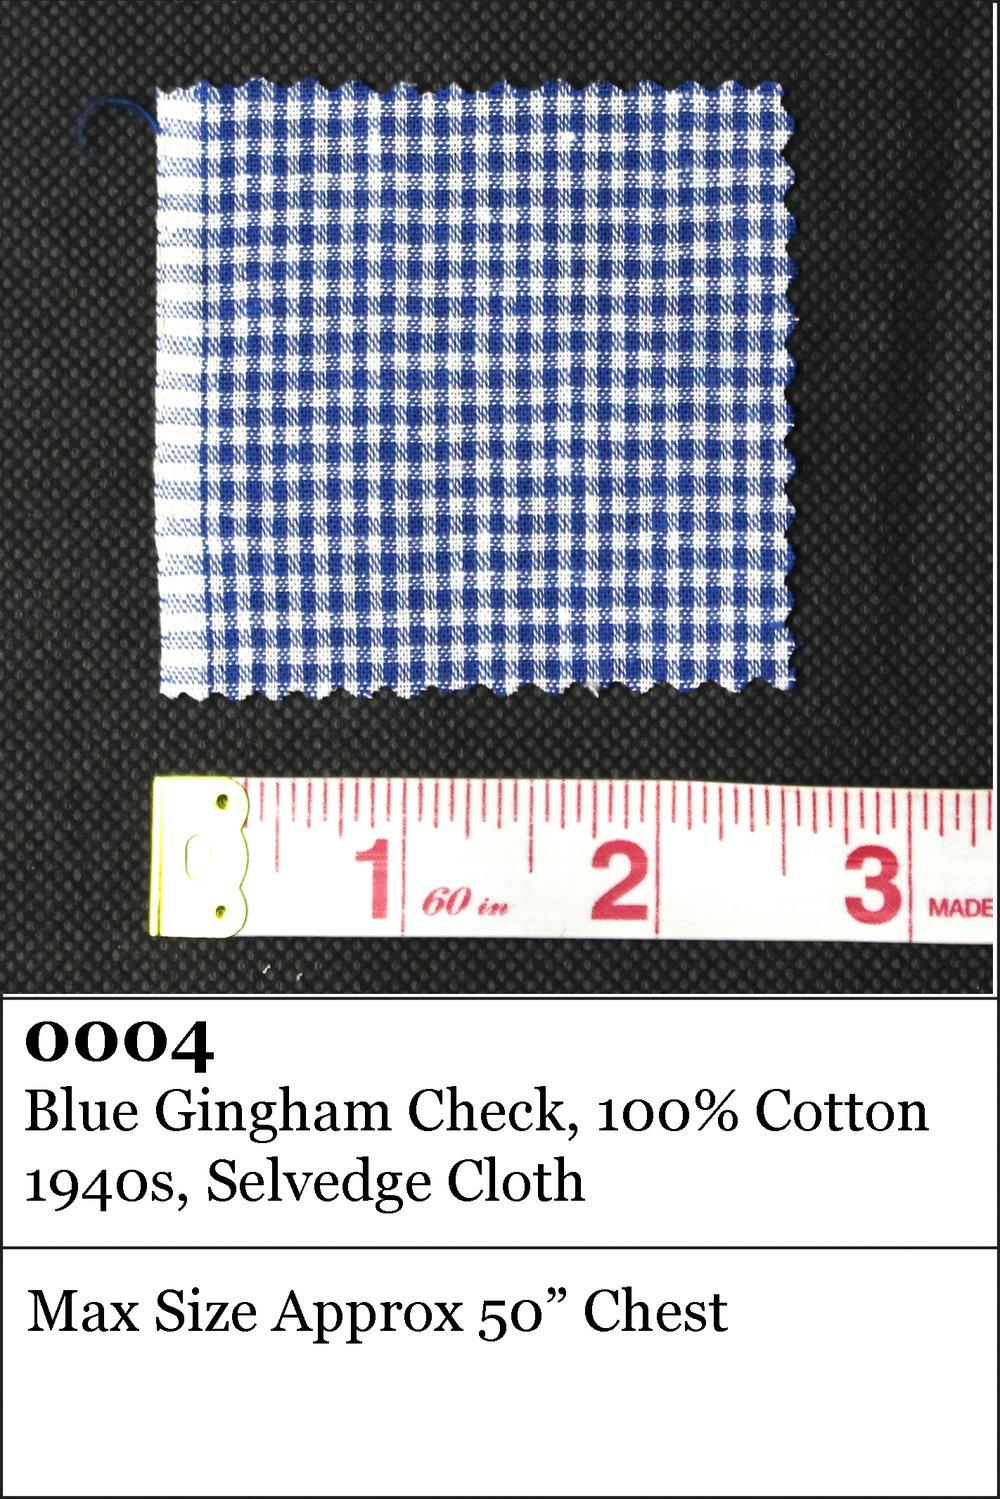 Fabric0004.jpg